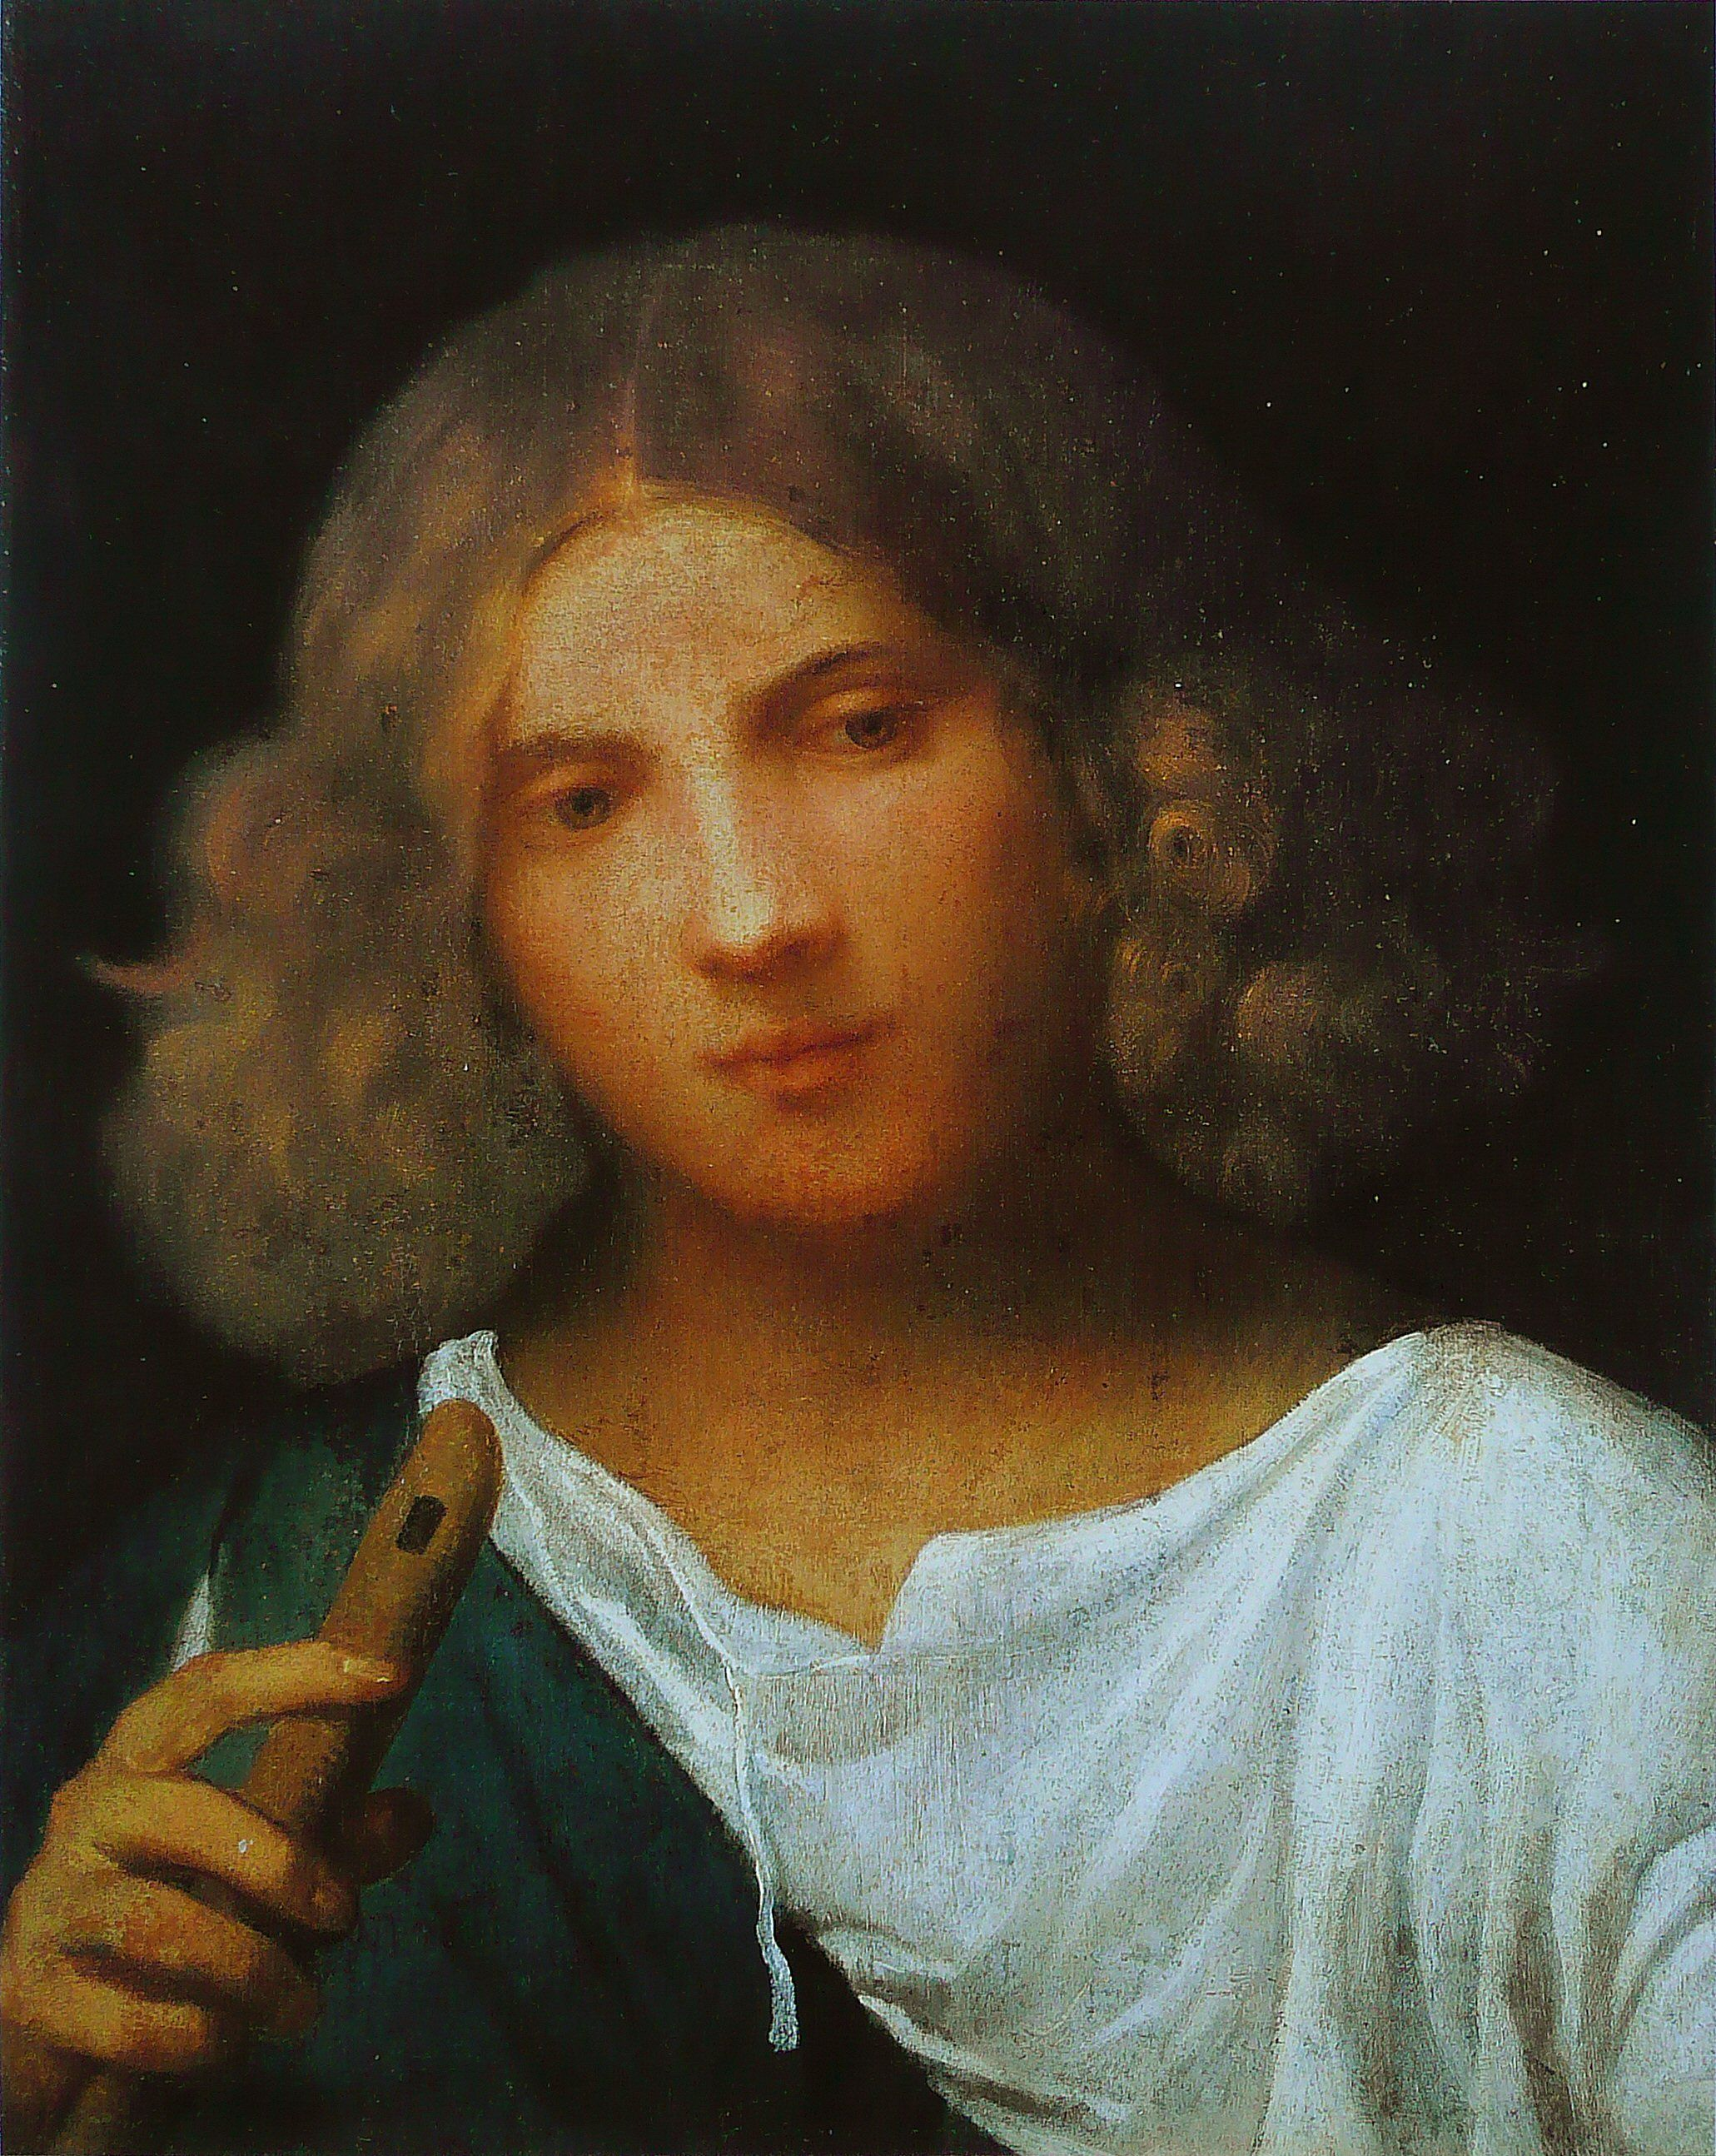 Giorgione, (Italian 1477–1510) [High Renaissance] Boy with Flute, 1508. Hampton Court, London.